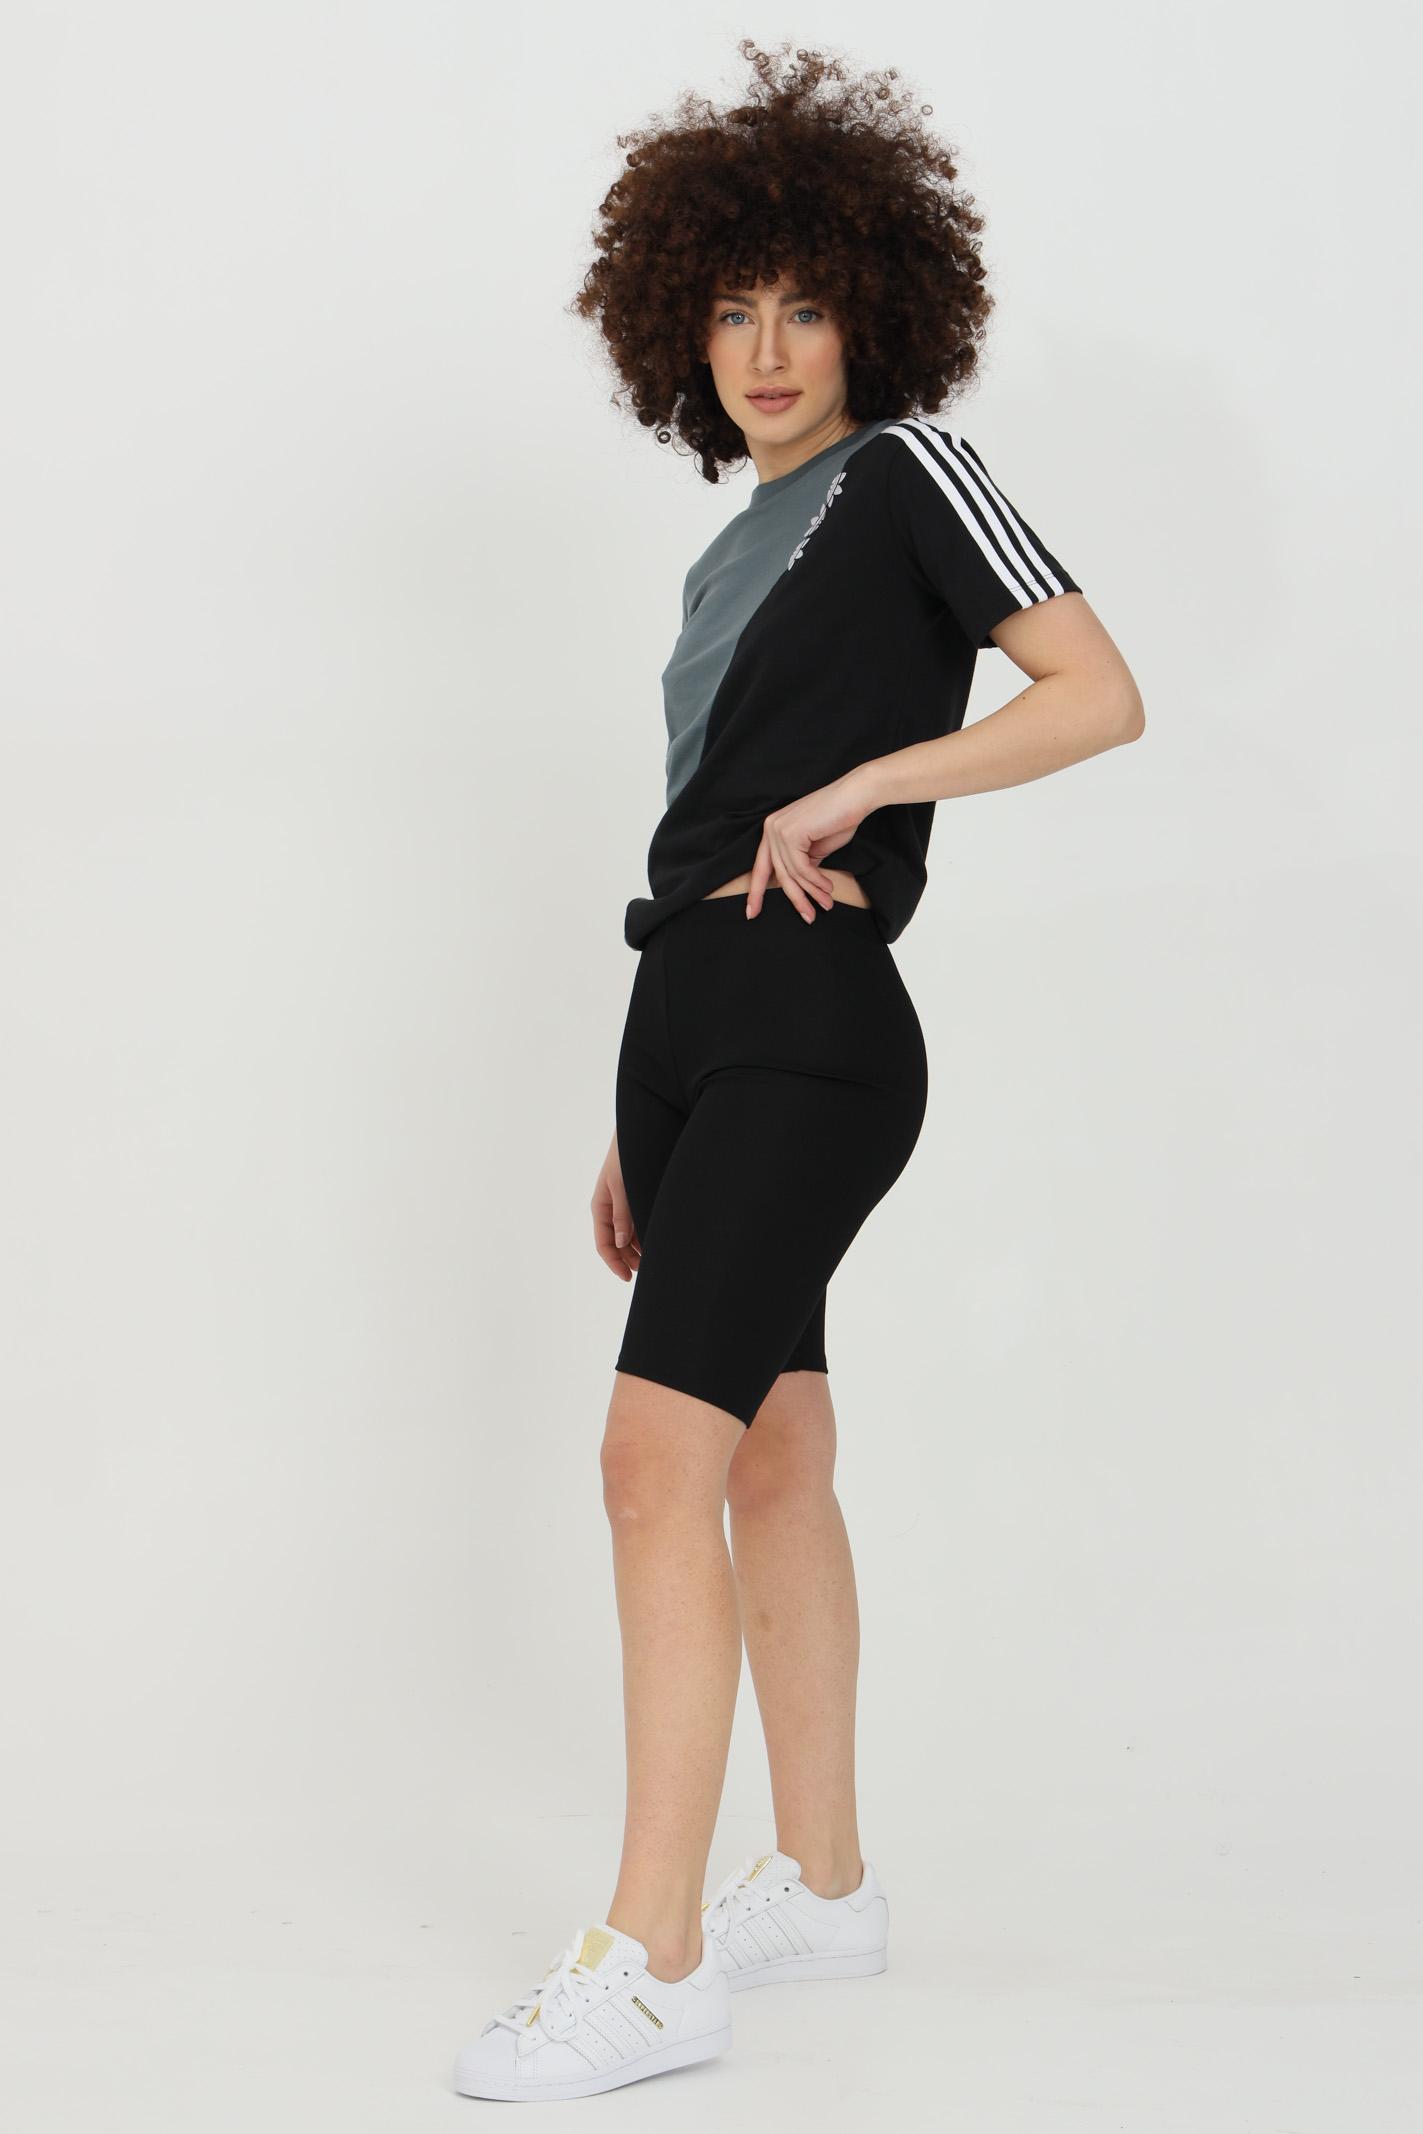 T-shirt donna nero azzurro adidas a manica corta ADIDAS | T-shirt | GN2827.